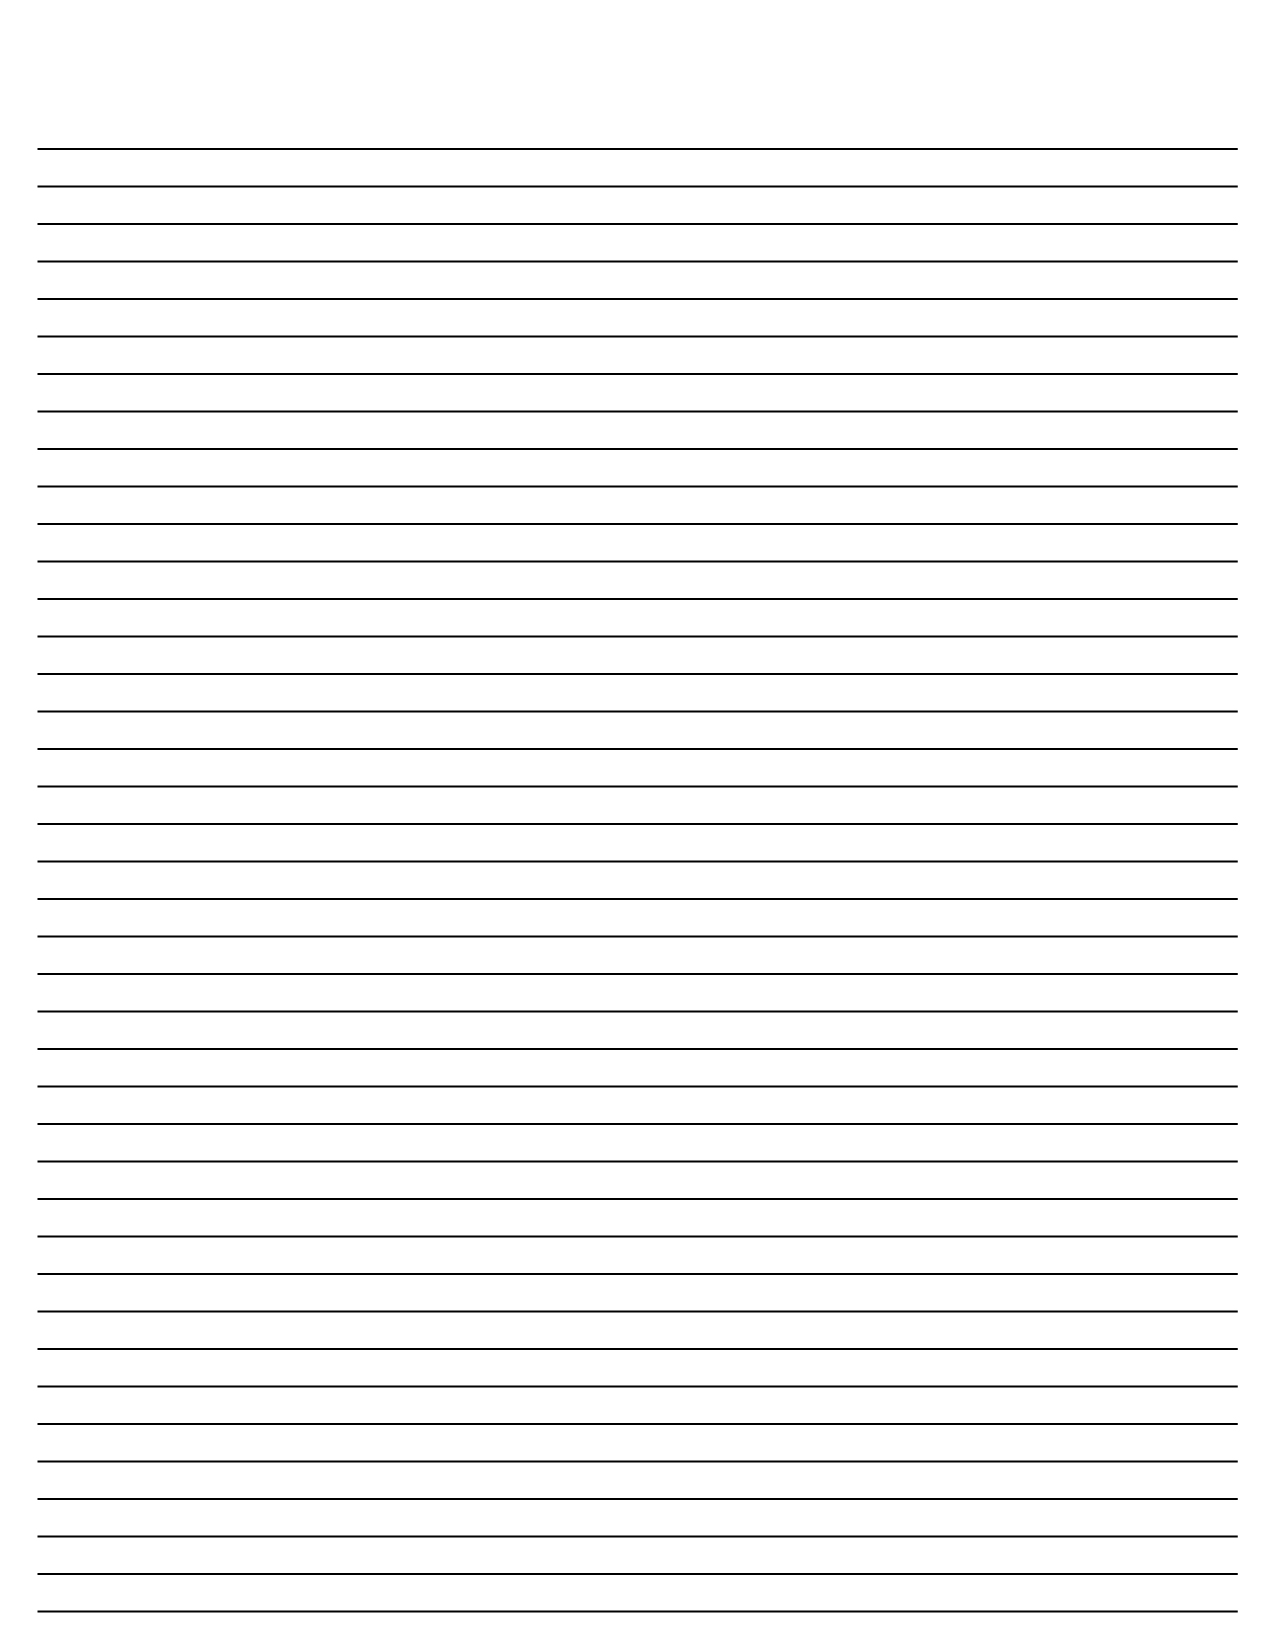 4 Best Images Of College Blank Writing Worksheet Printable